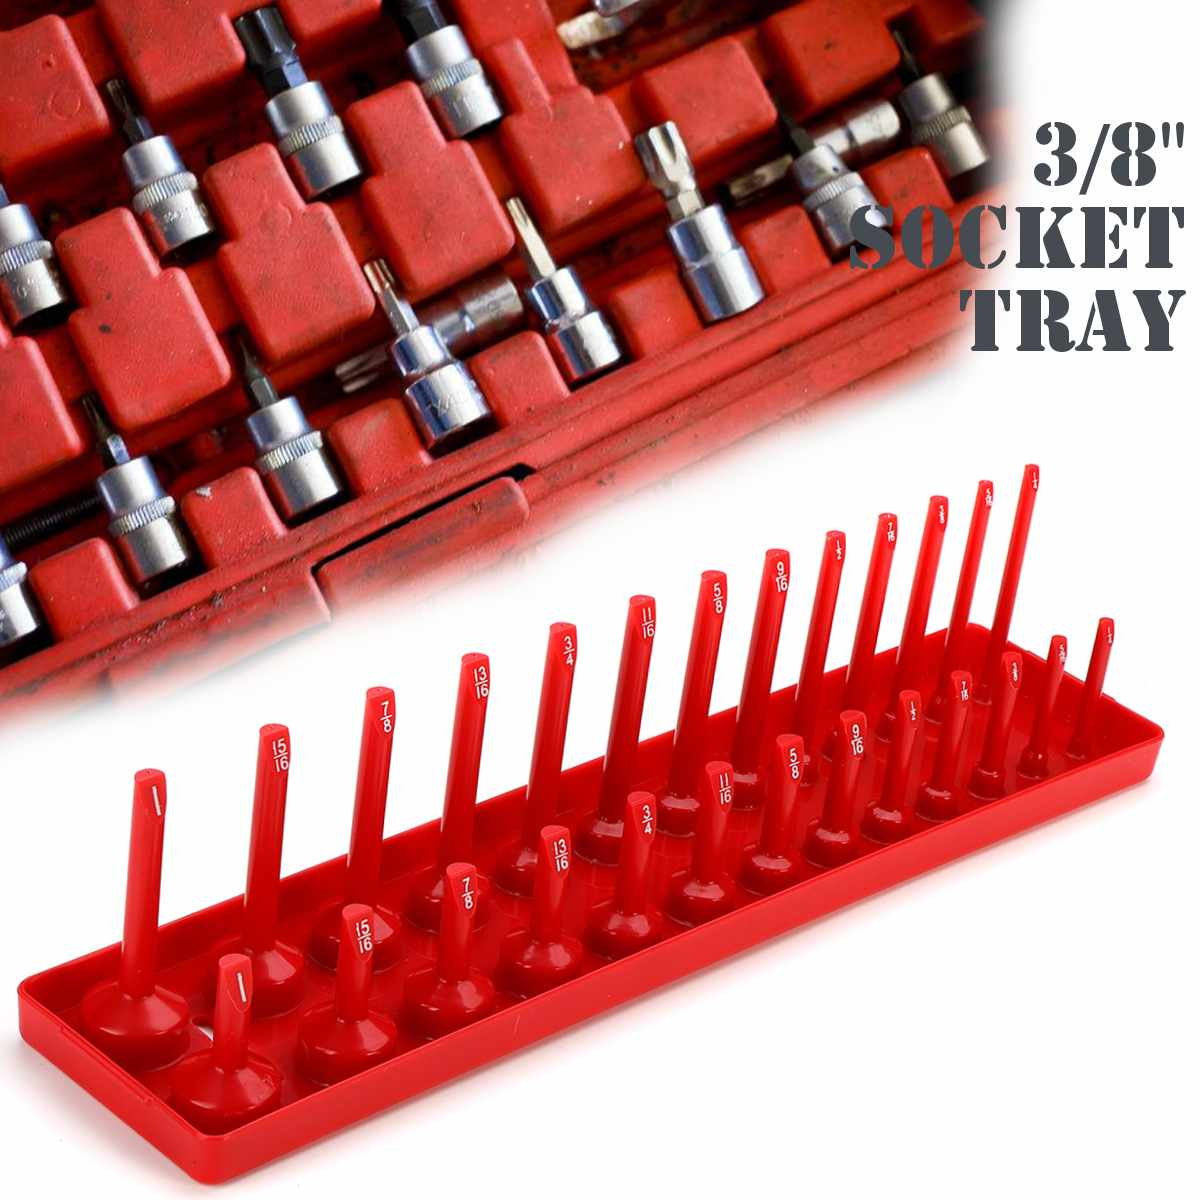 Hand Tools Doersupp 3/8 Sae Deep Standard 26 Sockets Socket Organizer Socket Tray Rack Molded Plastic Tray Hand Tools Wrench